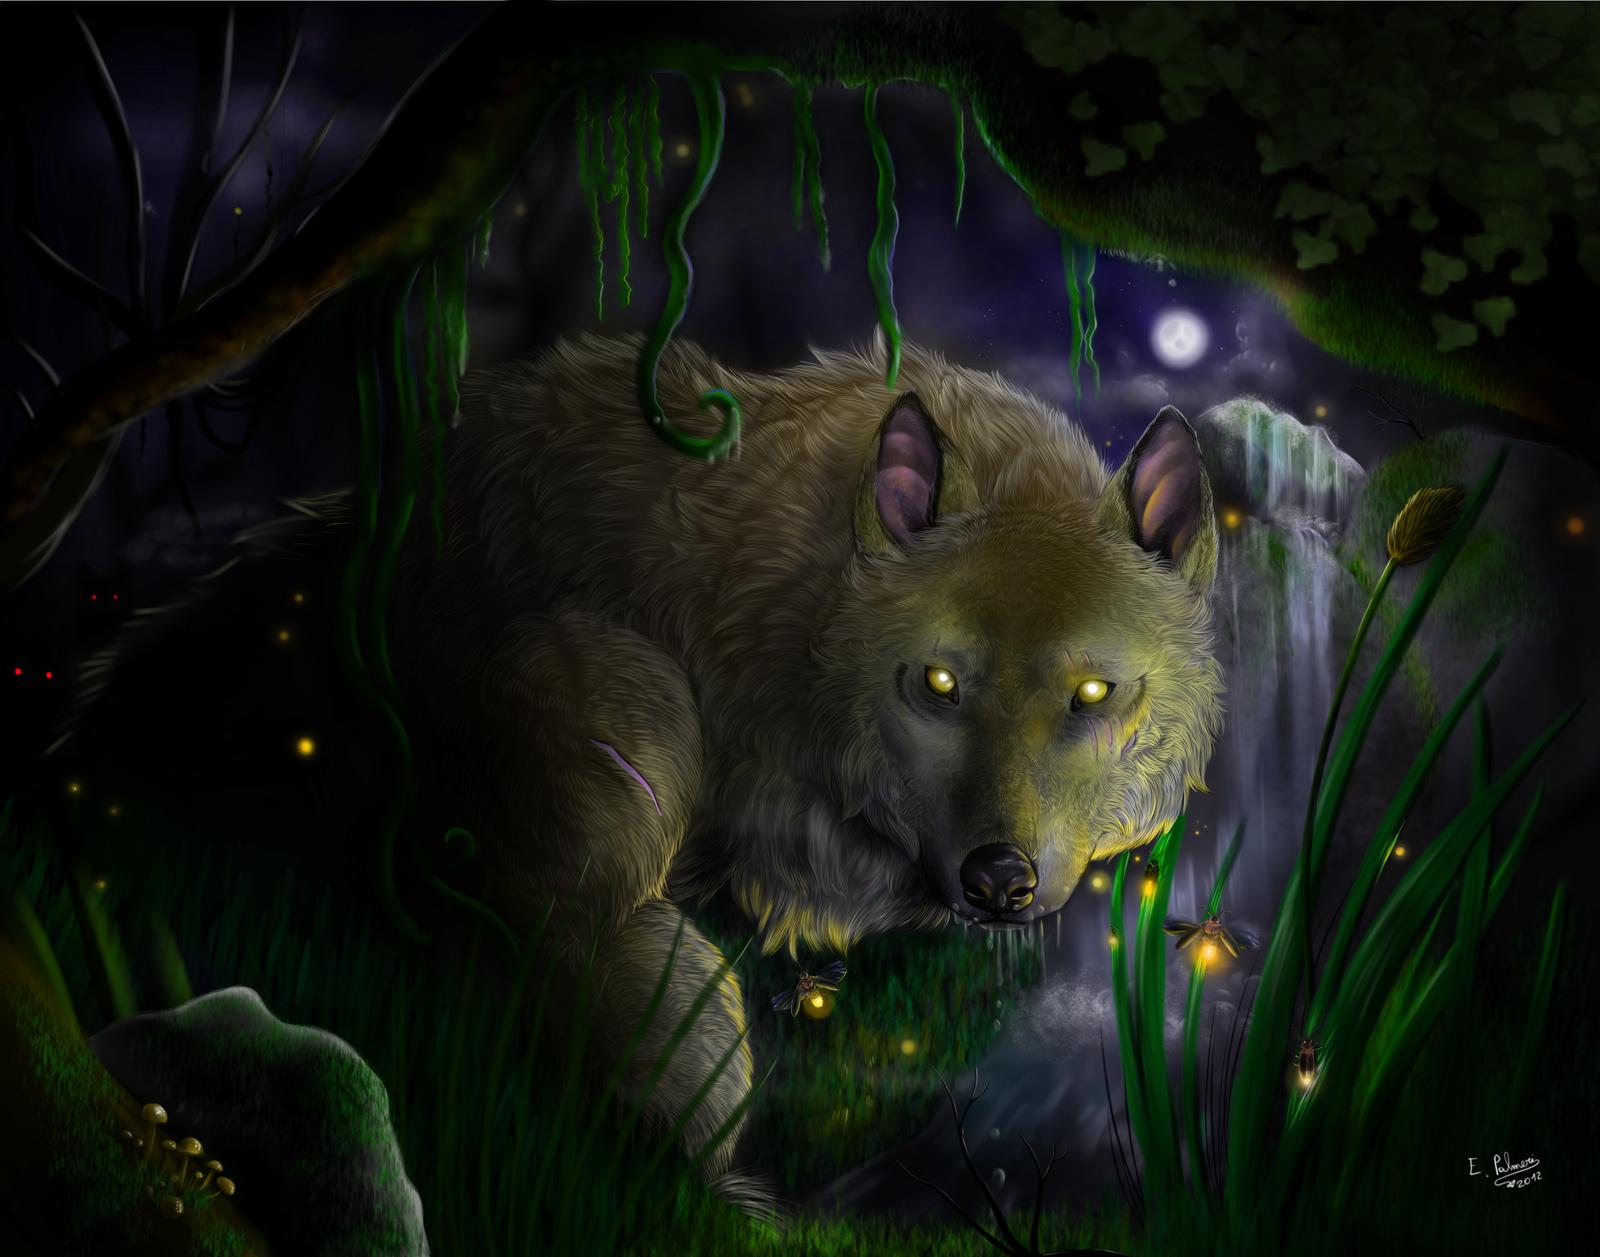 Surprised in the night - Werewolf by FuriarossaAndMimma